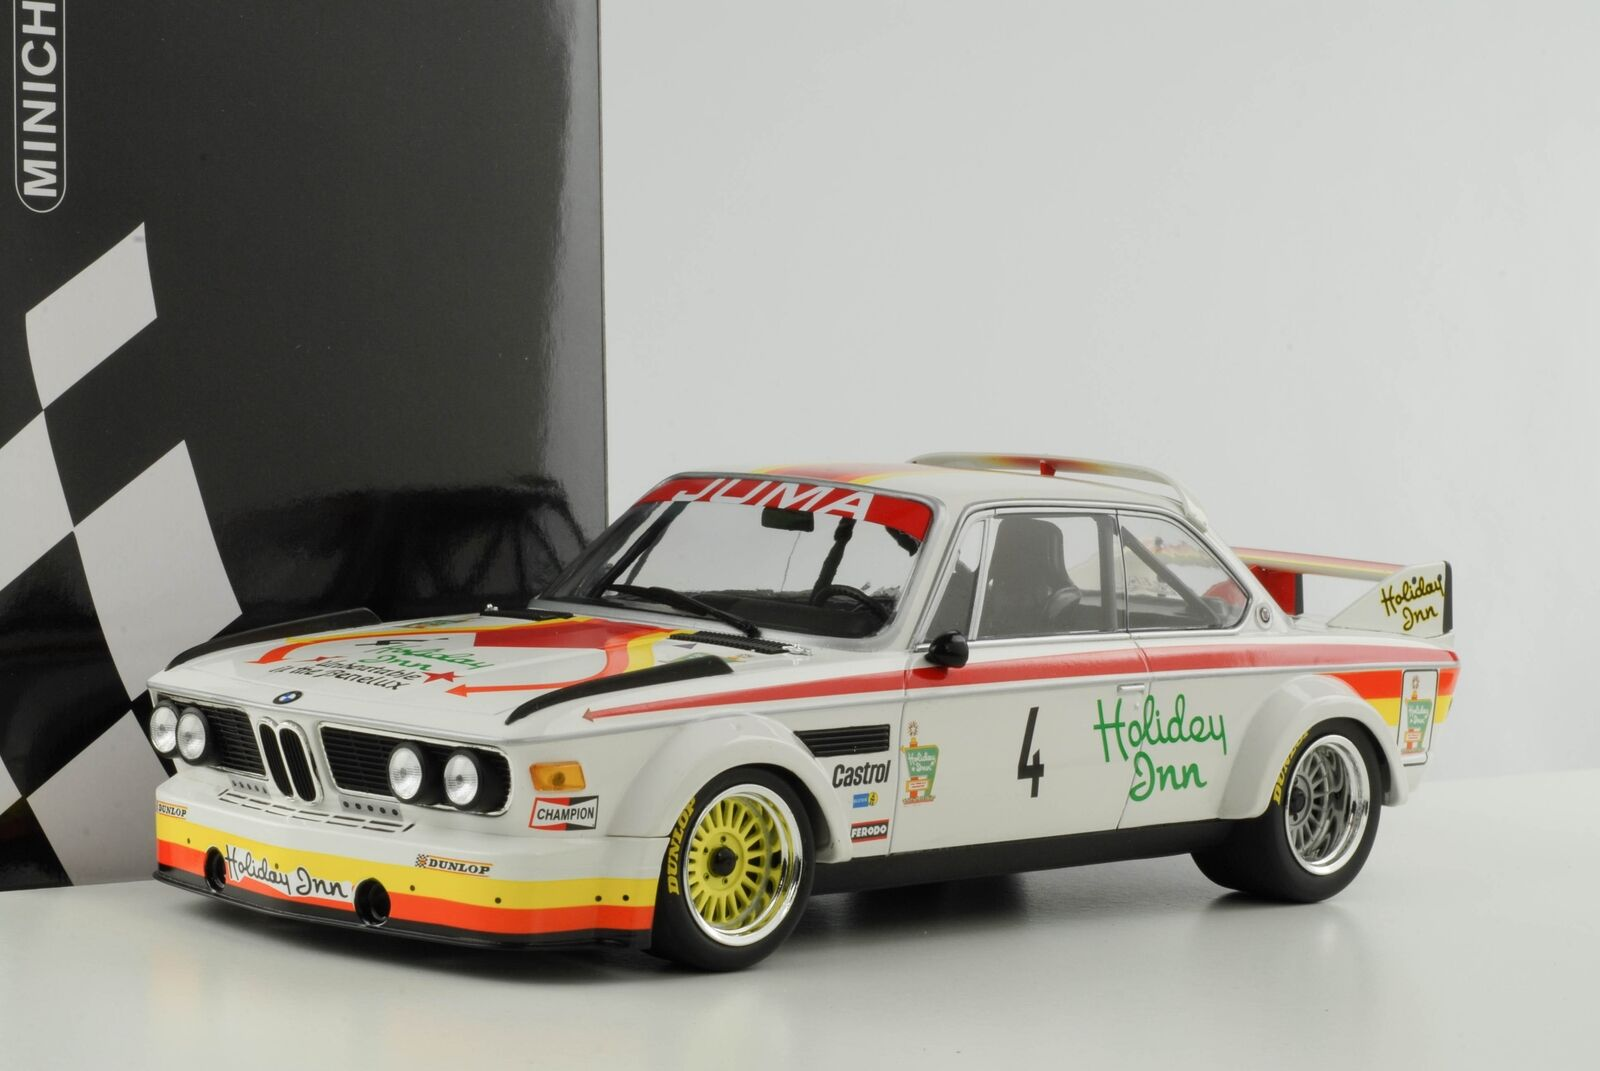 Bmw 3.0 CSL  4 corbisier joosen berndtson nurburgring 1976 Juma 1 18 Minichamps